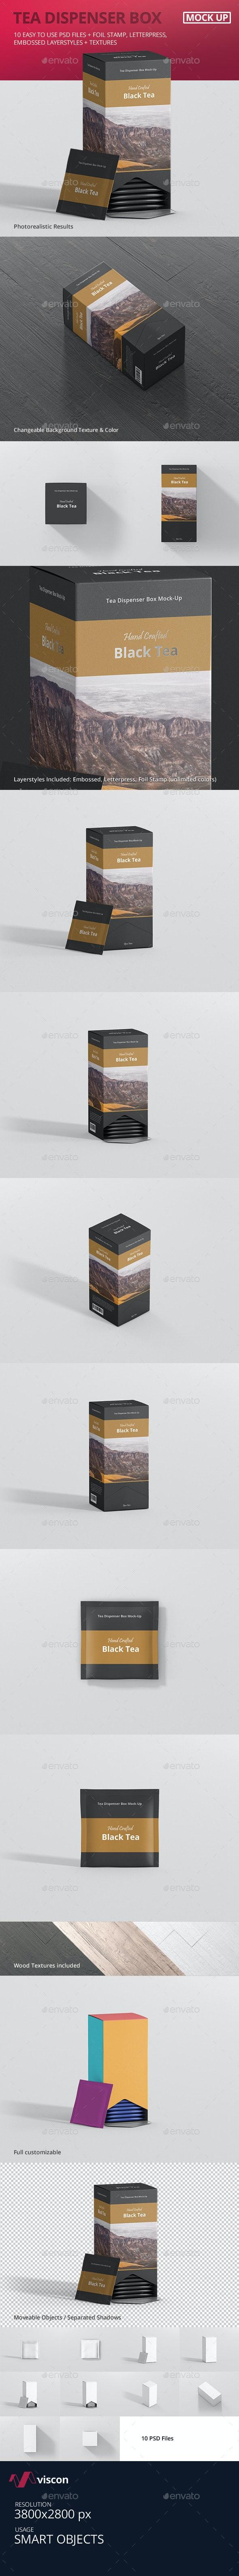 Tea Dispenser Box Mockup - Food and Drink Packaging